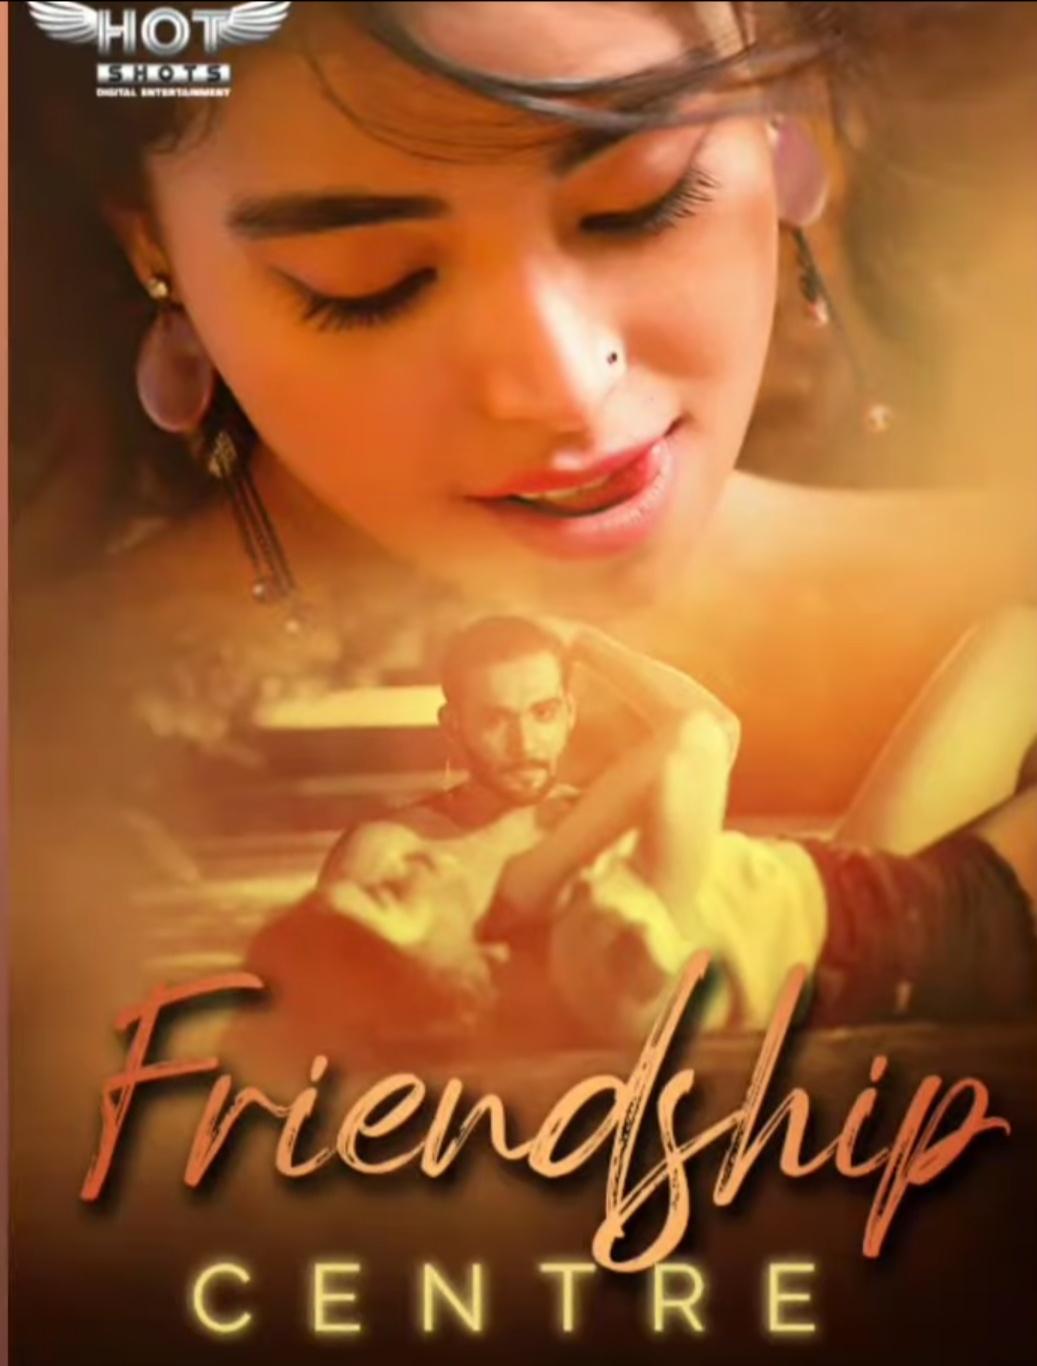 18+ Friendship Centre (2021) Hindi HotShots Digital Short Film 720p HDRip 130MB Download